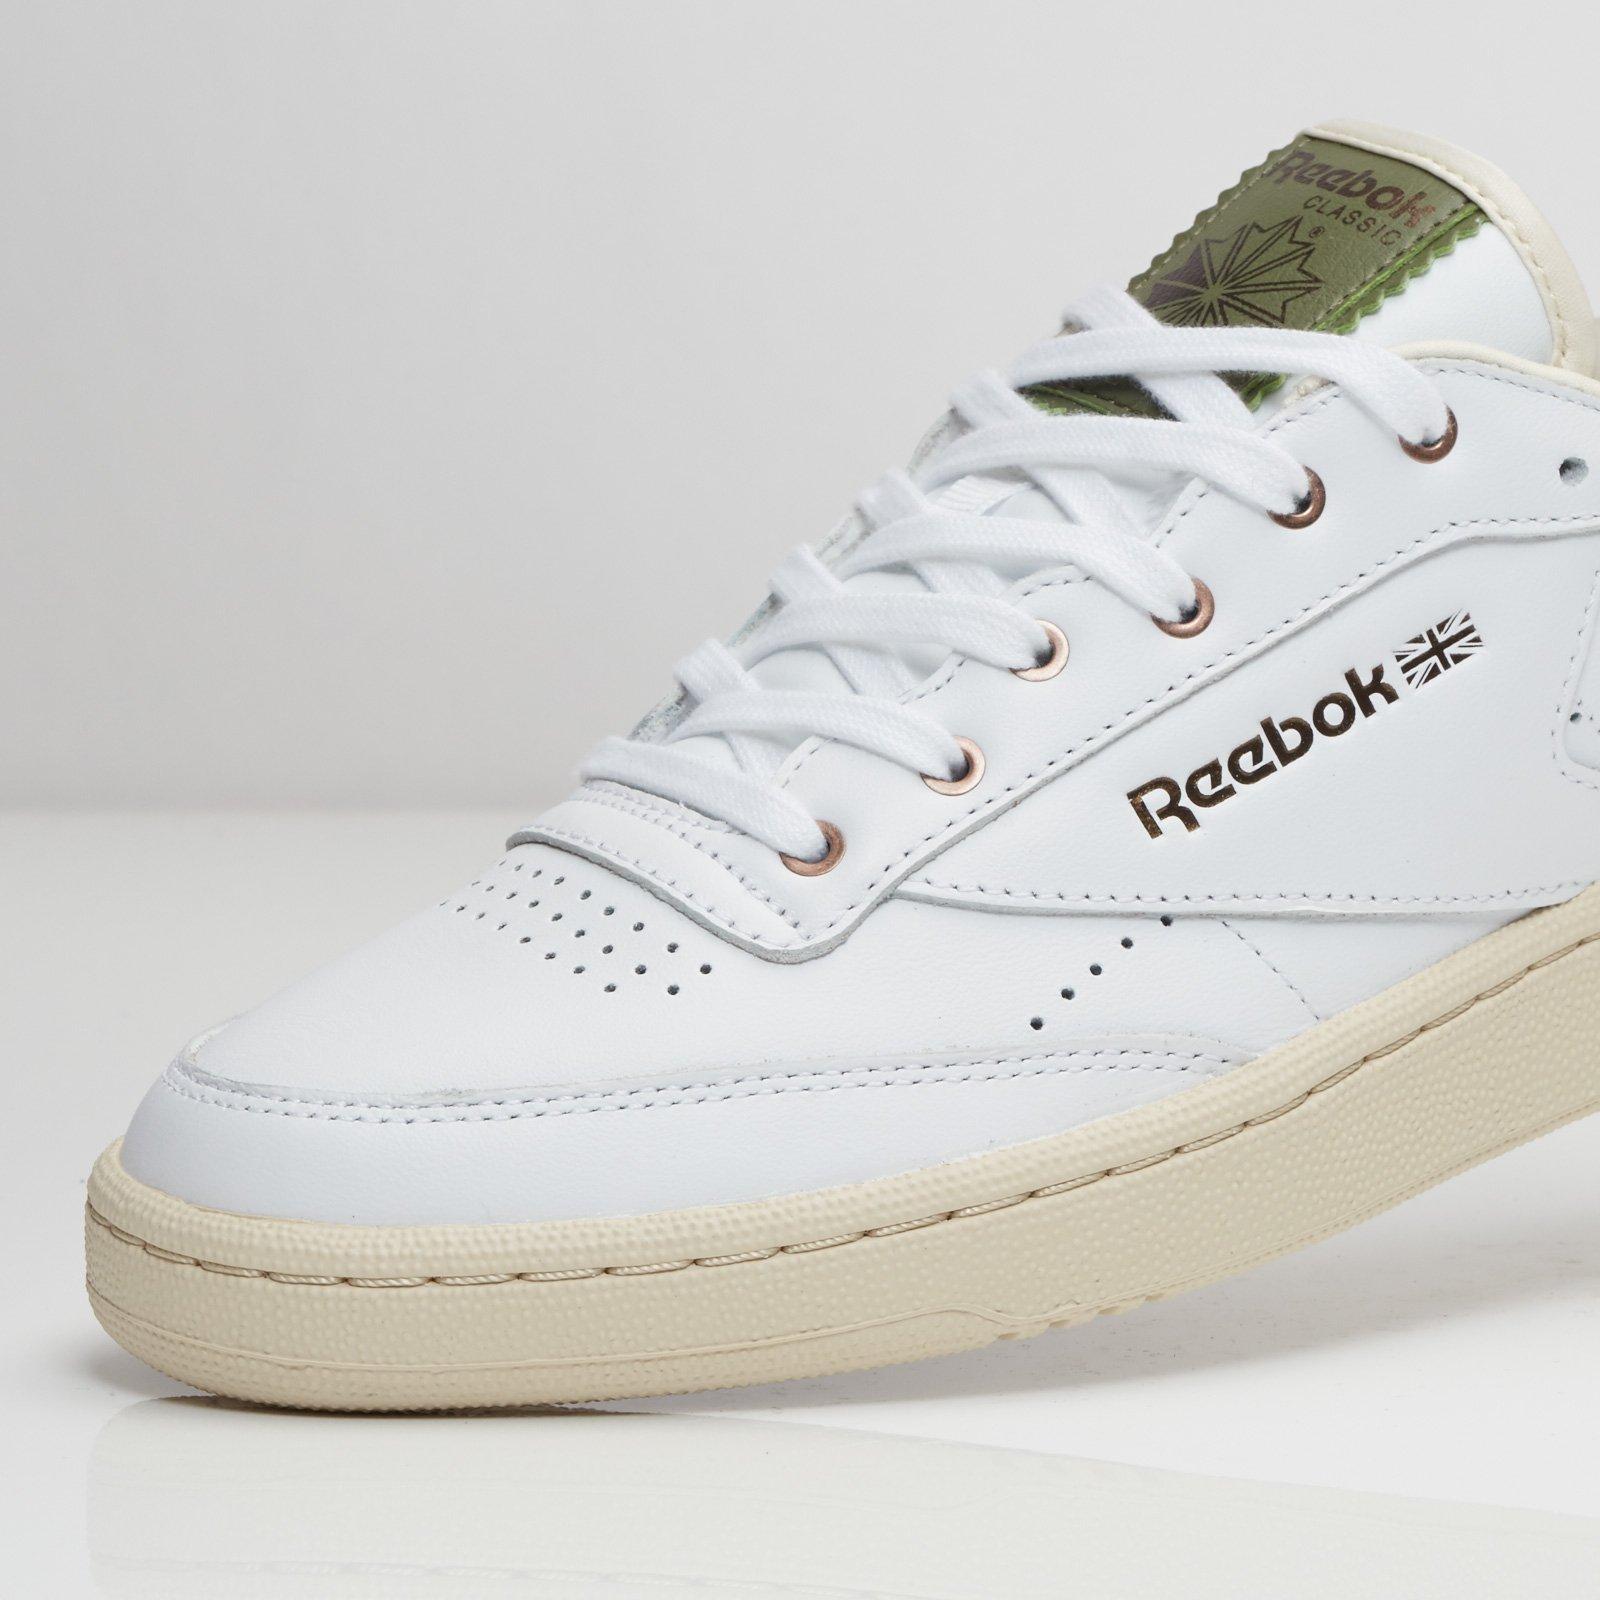 58333c8bd47 Reebok Club C 85 PL - Ar1284 - Sneakersnstuff